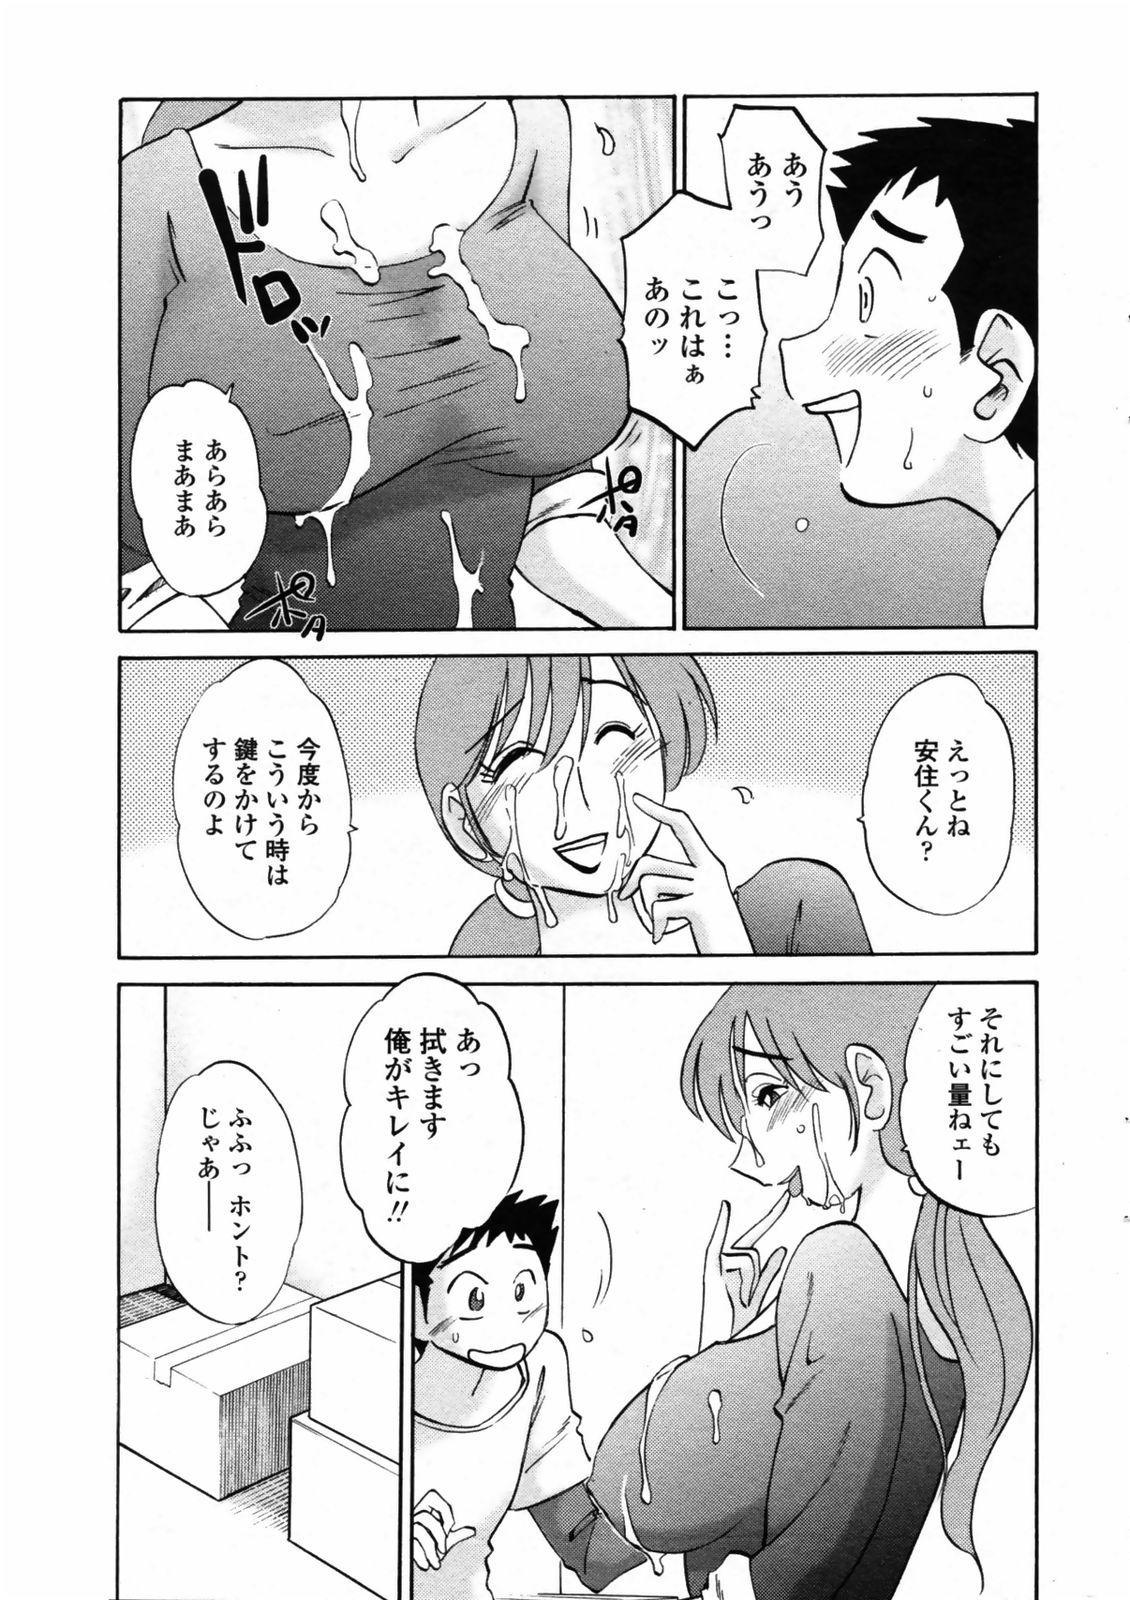 [Tsuyatsuya] Azumi-kun to Issho chapt.1-5 (Comic Penguin Club) 19